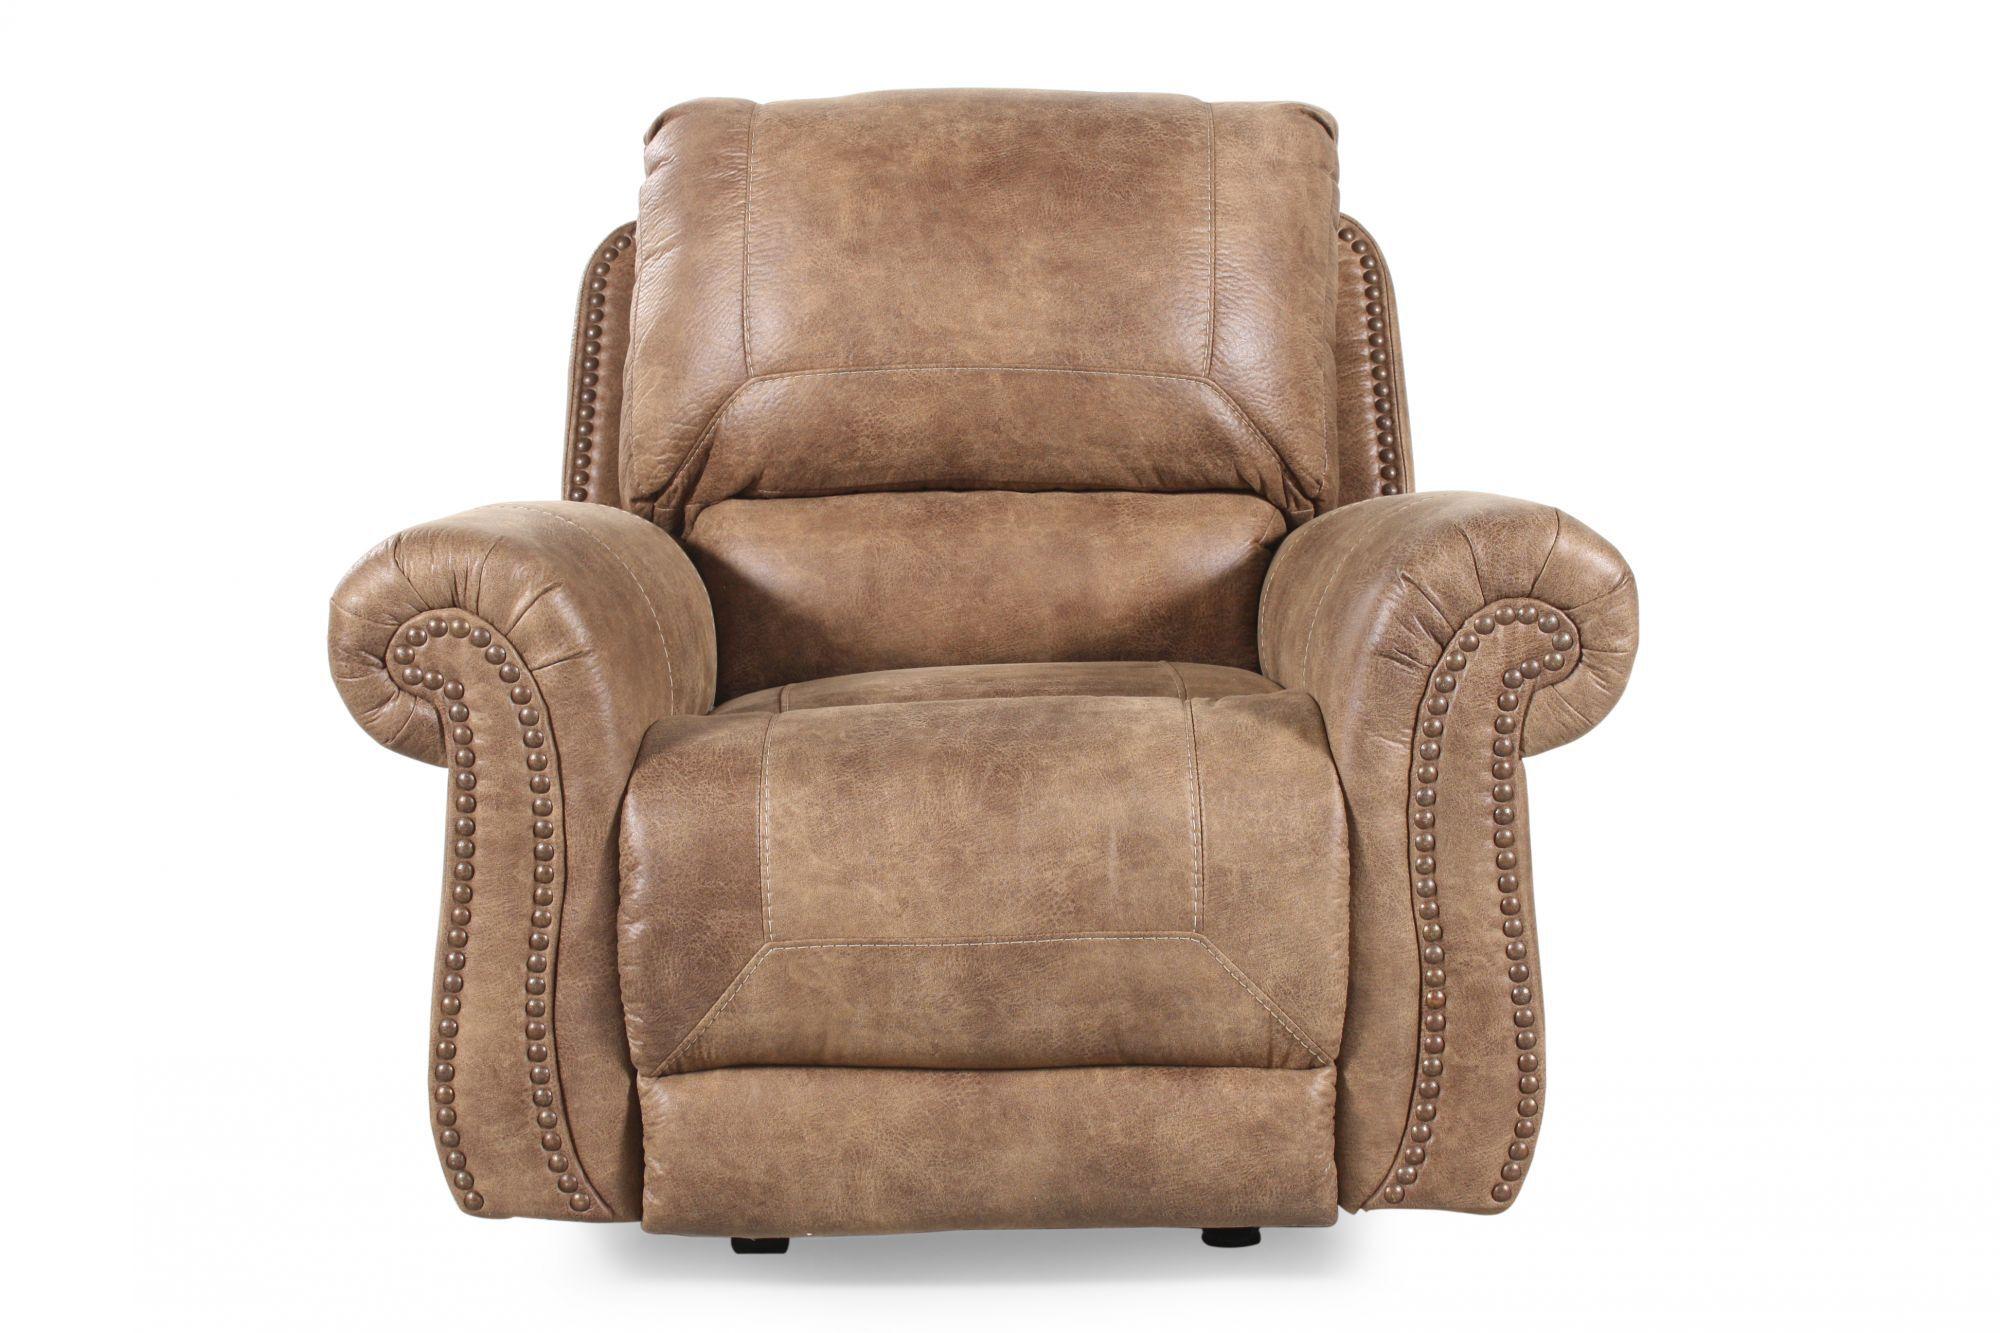 ashley larkinhurst rocker recliner - Rocker Recliners